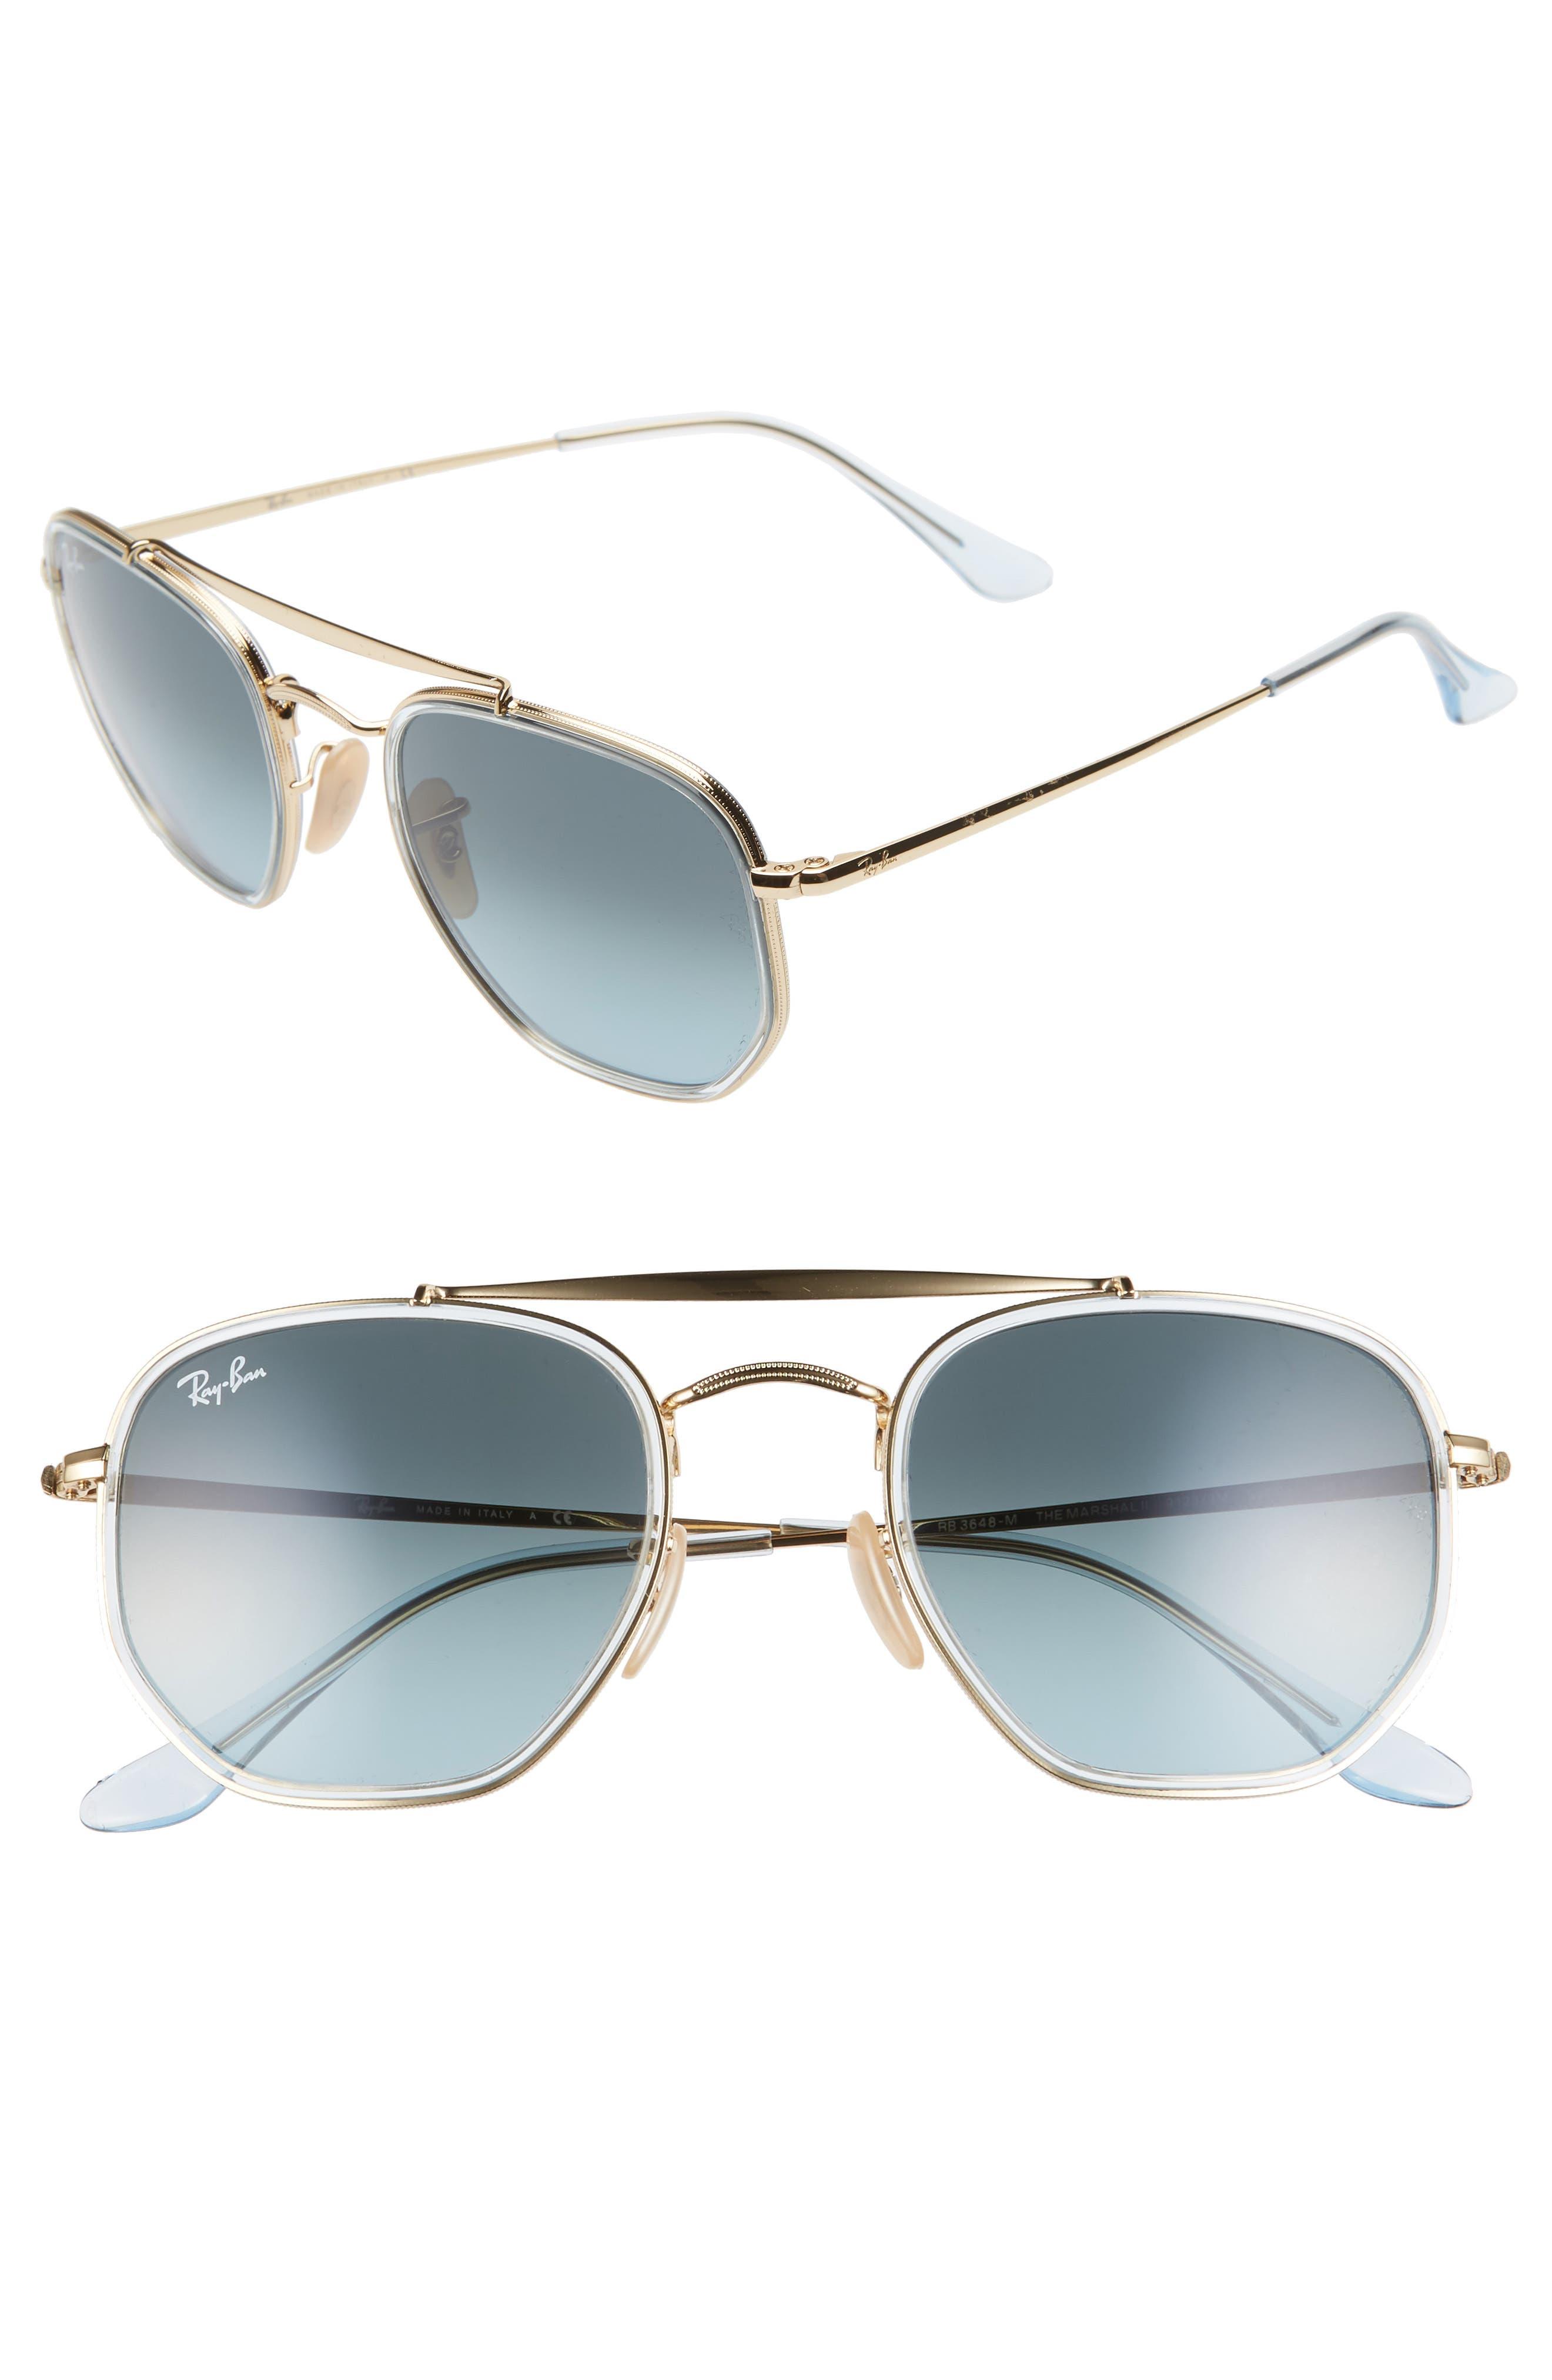 Ray-Ban 52Mm Aviator Sunglasses - Gold/ Blue Gradient